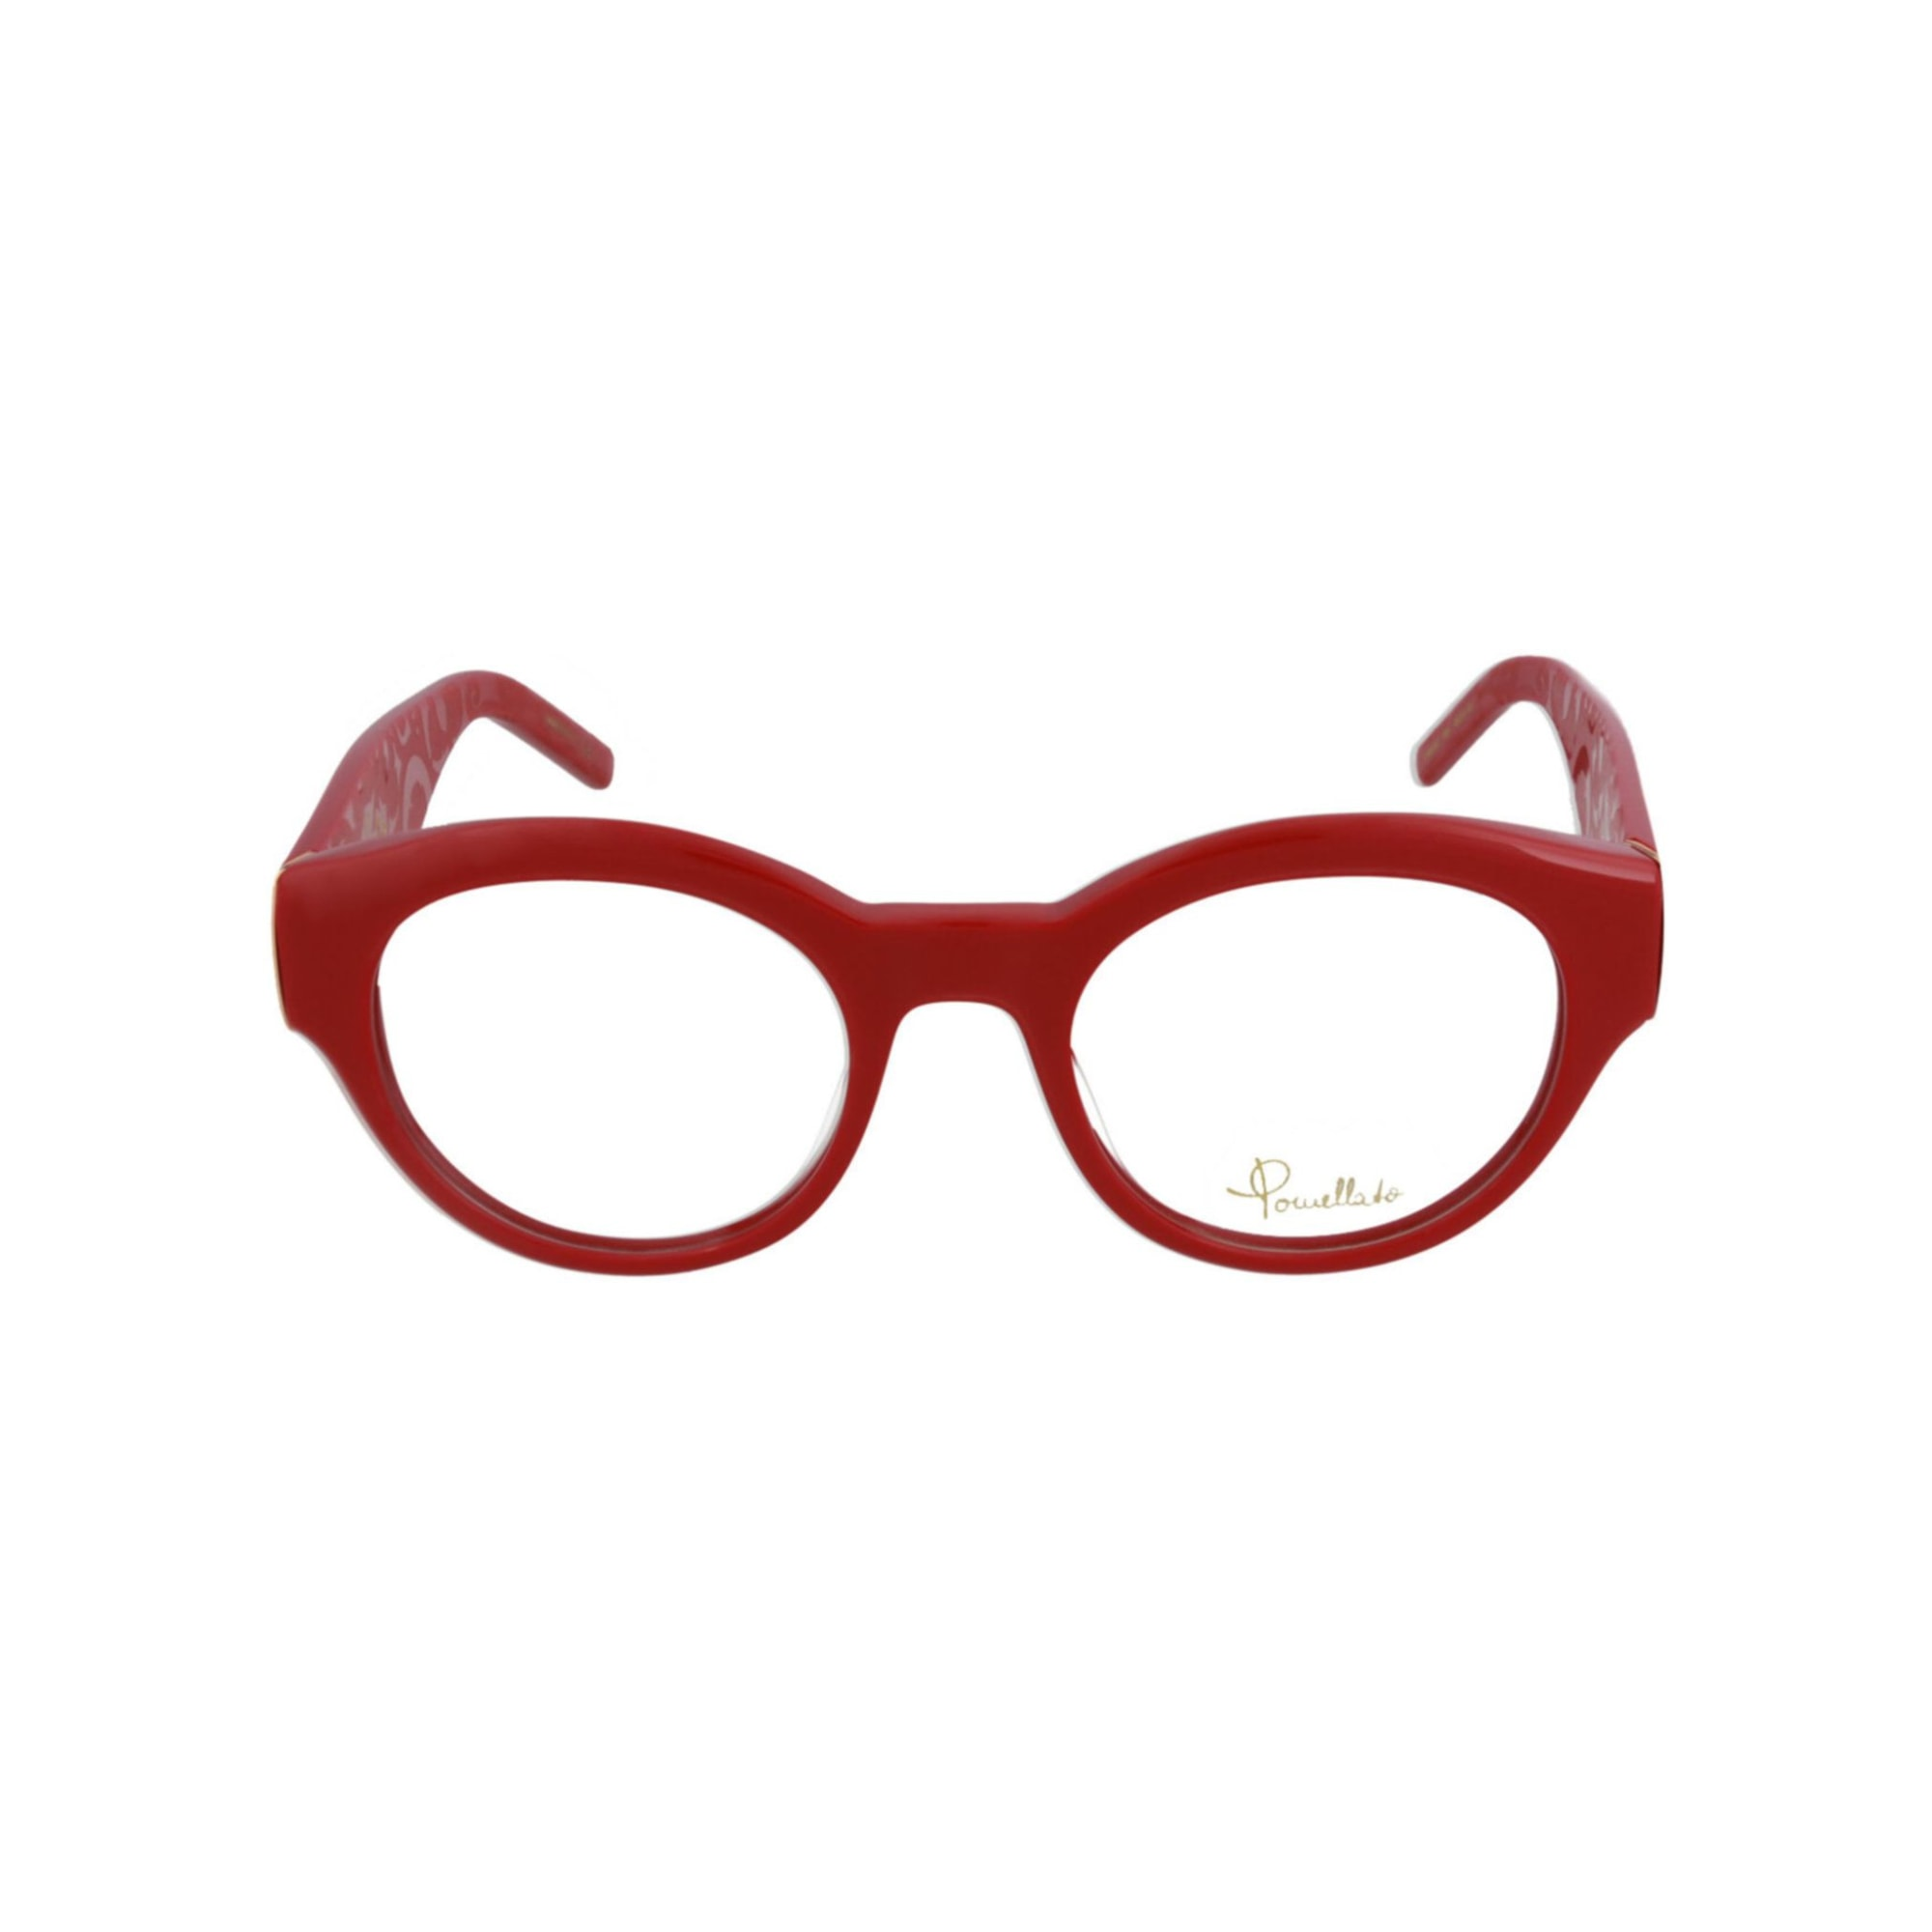 Eyeglass Frames POMELLATO Red, burgundy